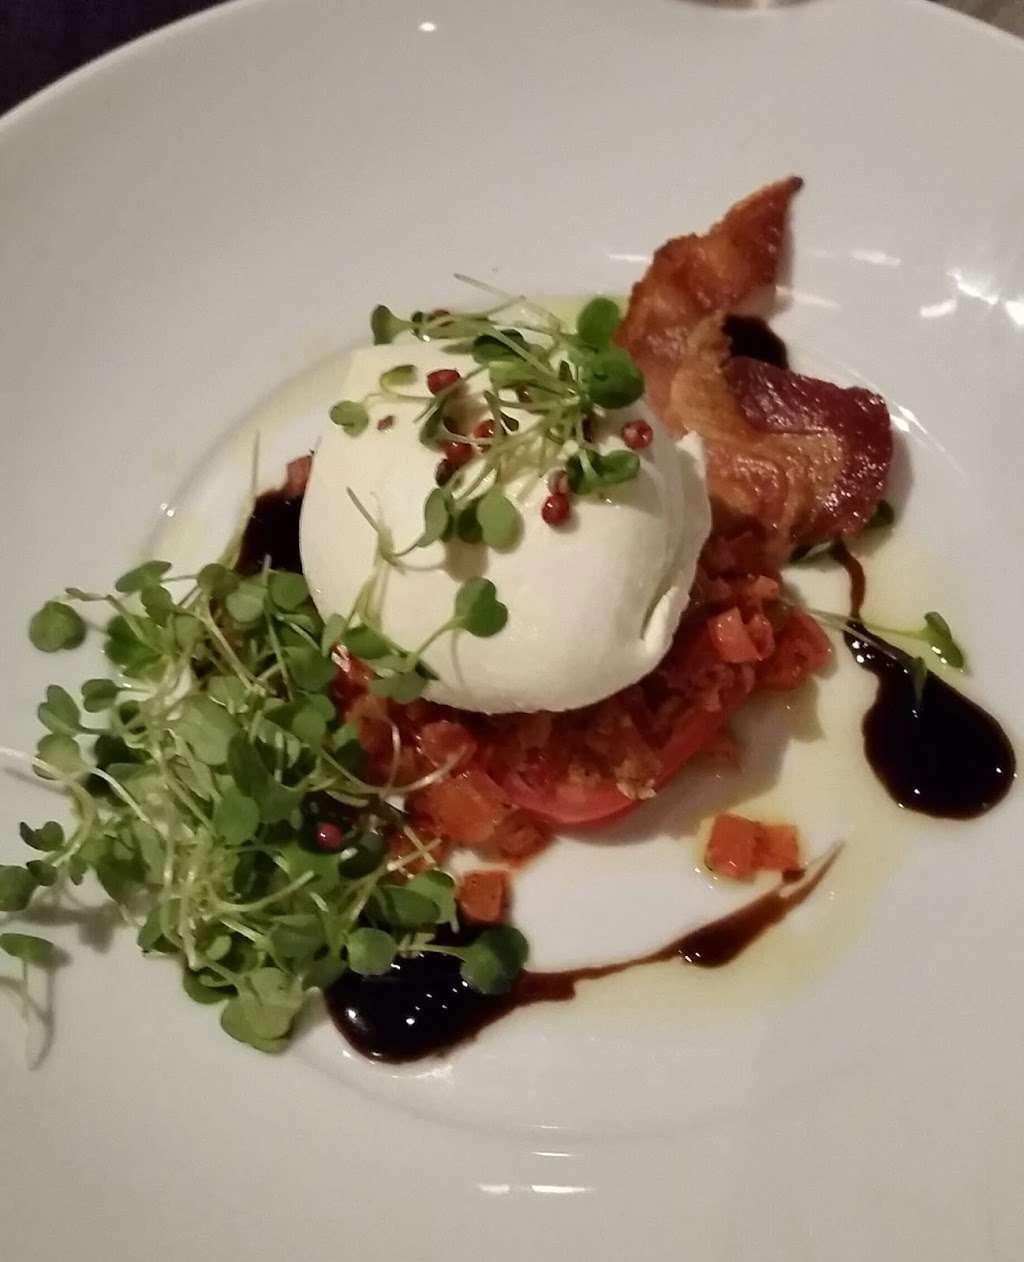 Pancetta - restaurant  | Photo 2 of 10 | Address: 100 Frank W Burr Blvd, Teaneck, NJ 07666, USA | Phone: (201) 928-2009